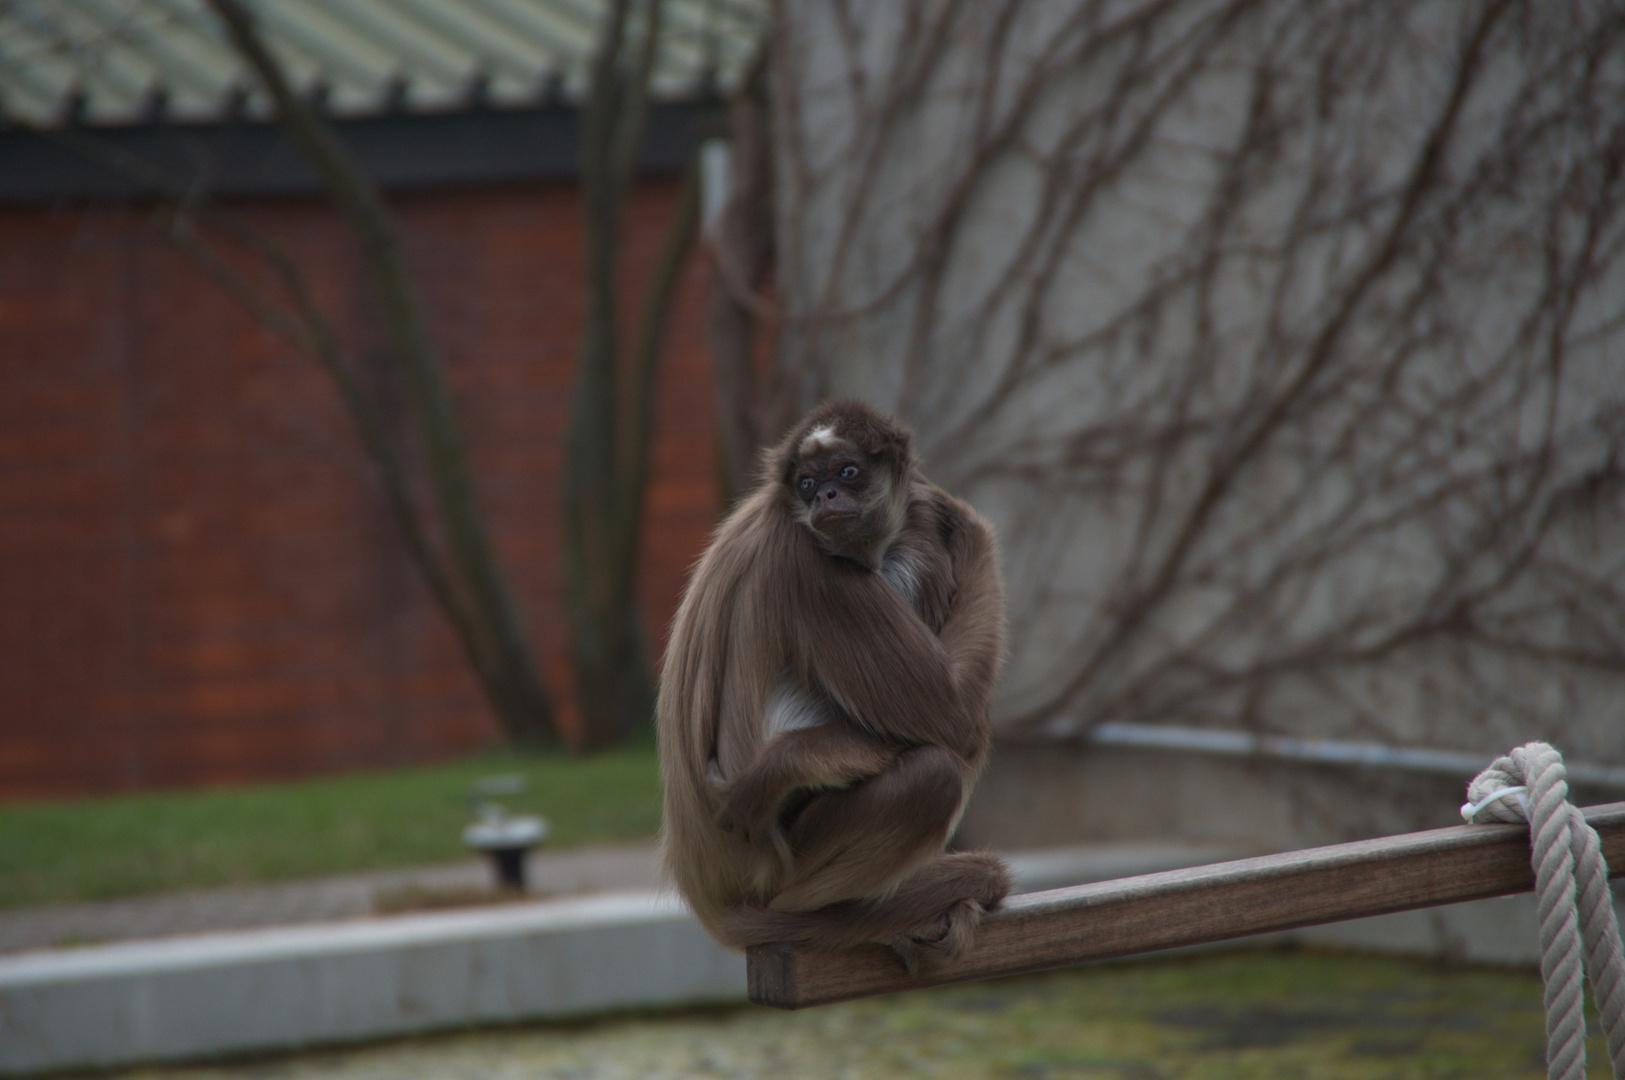 lonely monkey